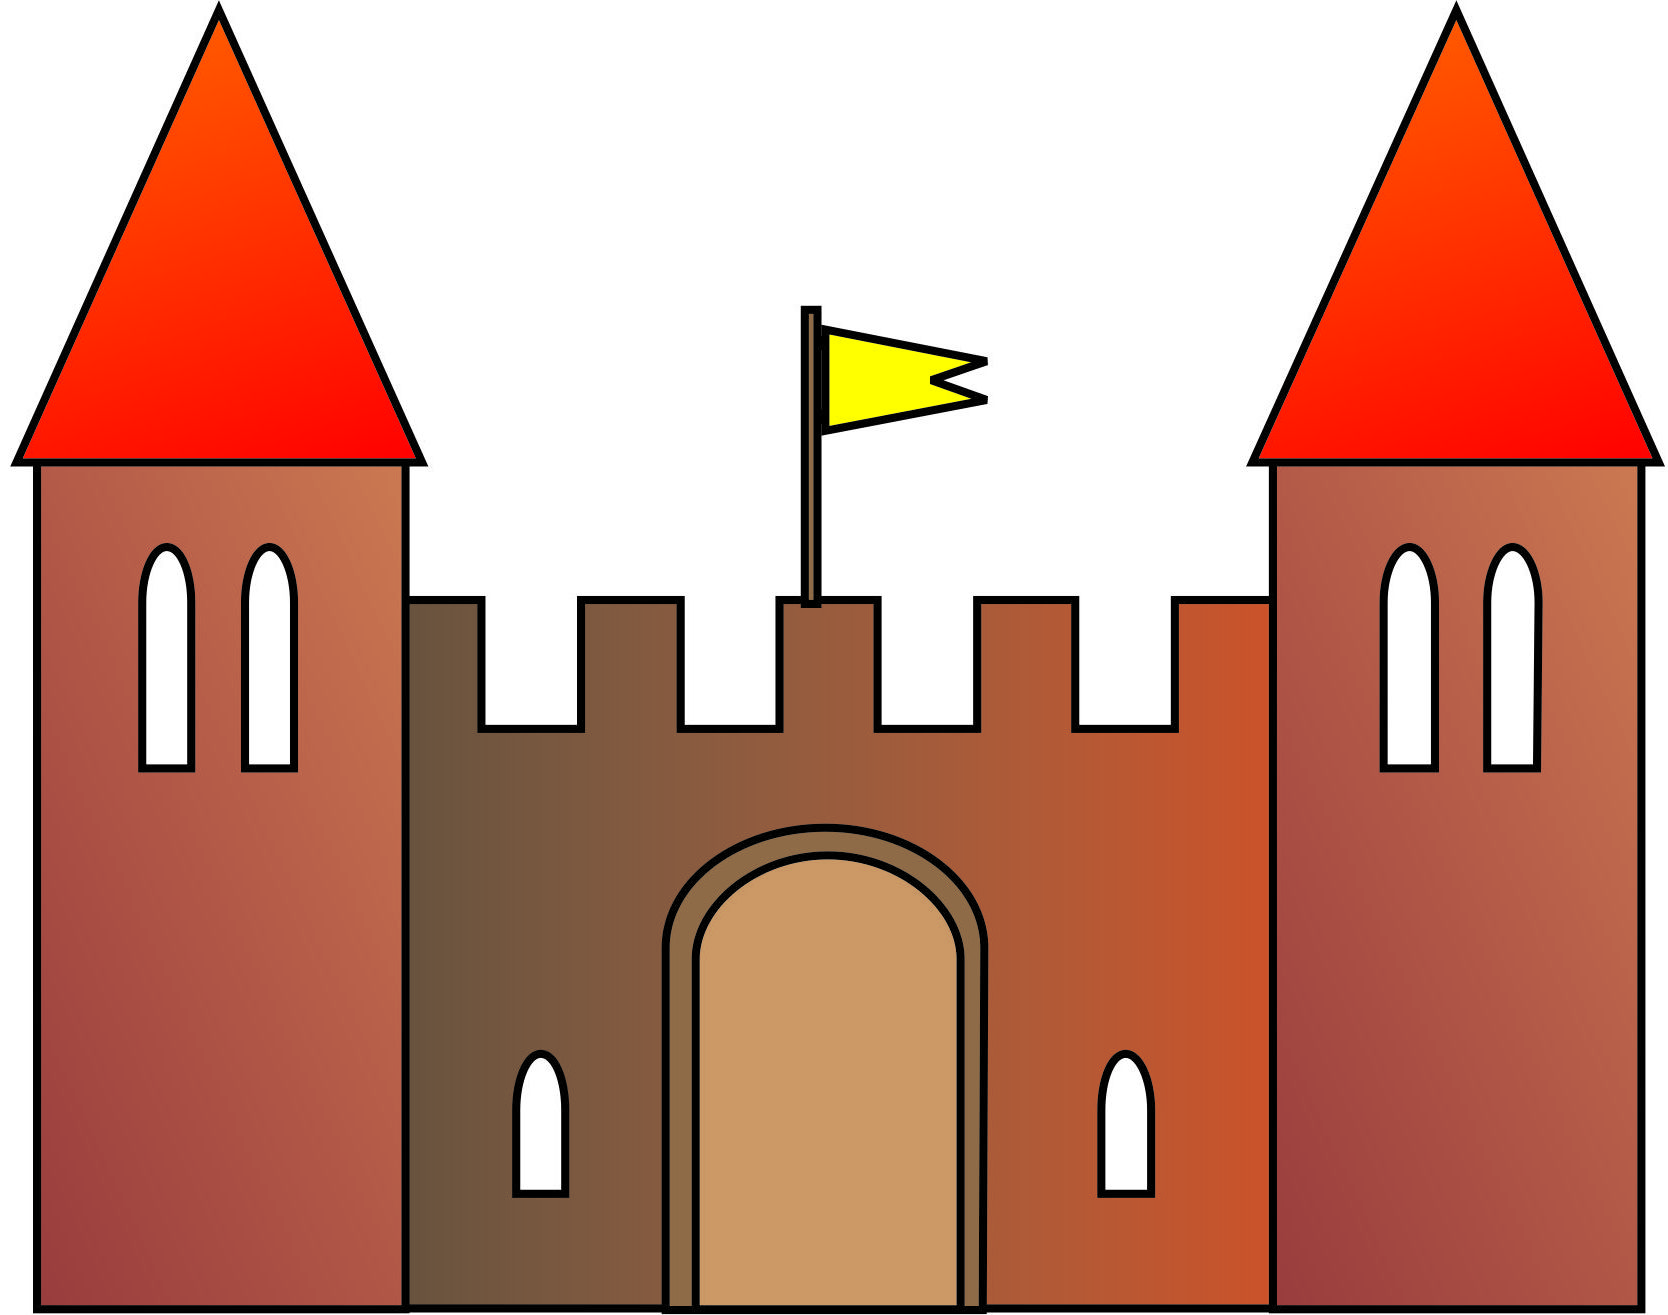 Clipart castle basic. Simple free download best